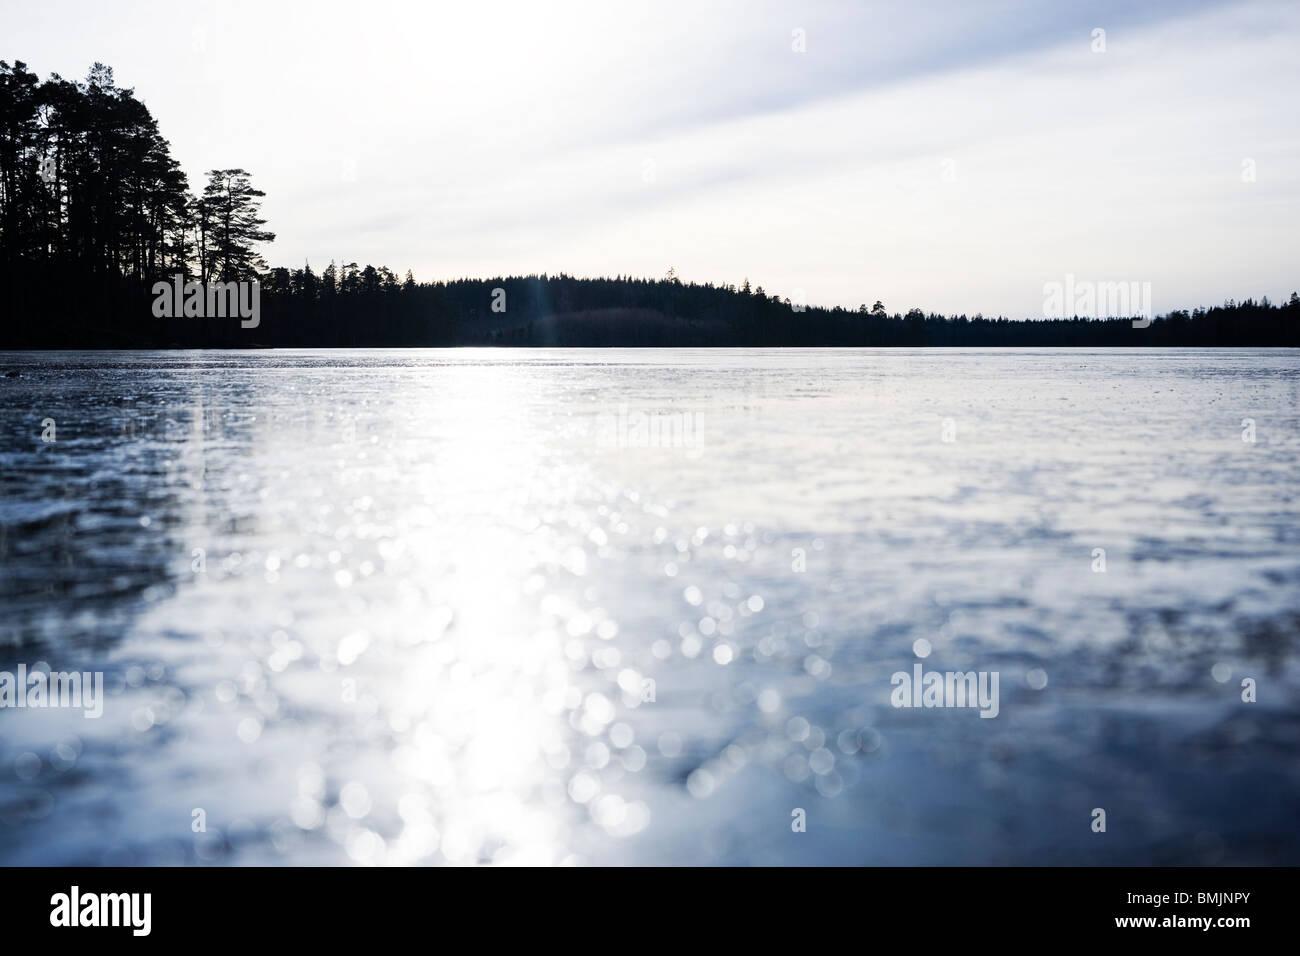 Scandinavian Peninsula, Sweden, Skane, View of frozen landscape - Stock Image